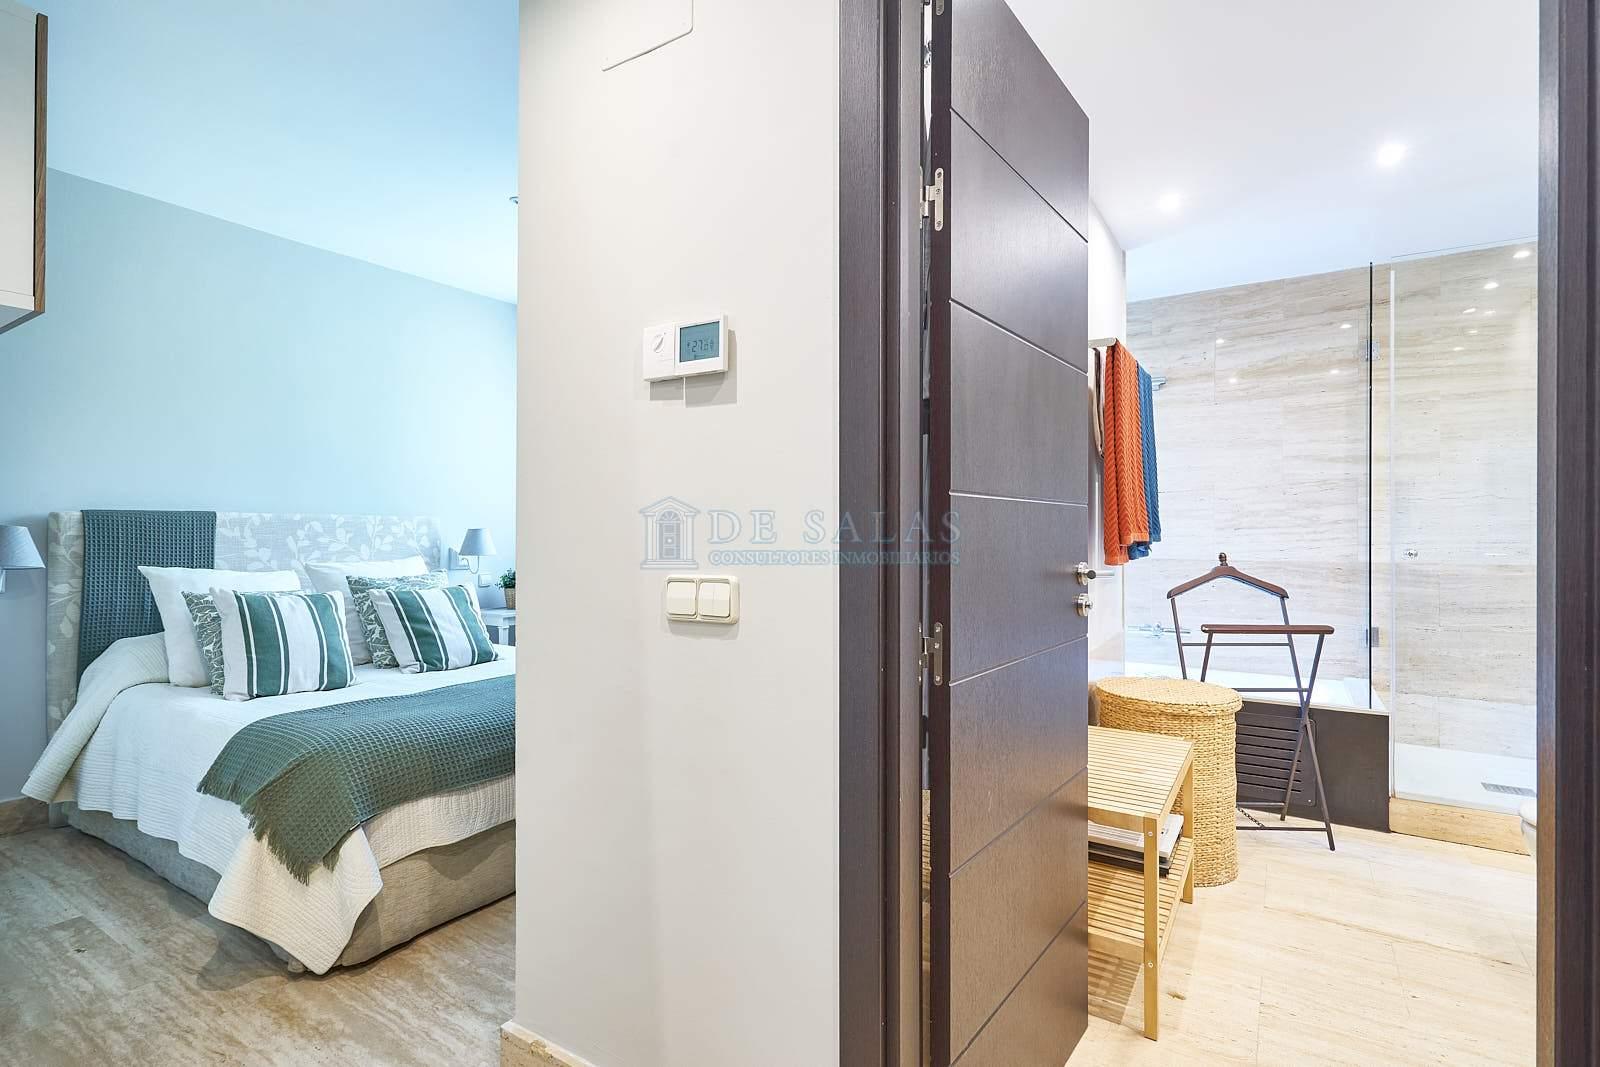 Dormitorio-023 Piso Soto de la Moraleja